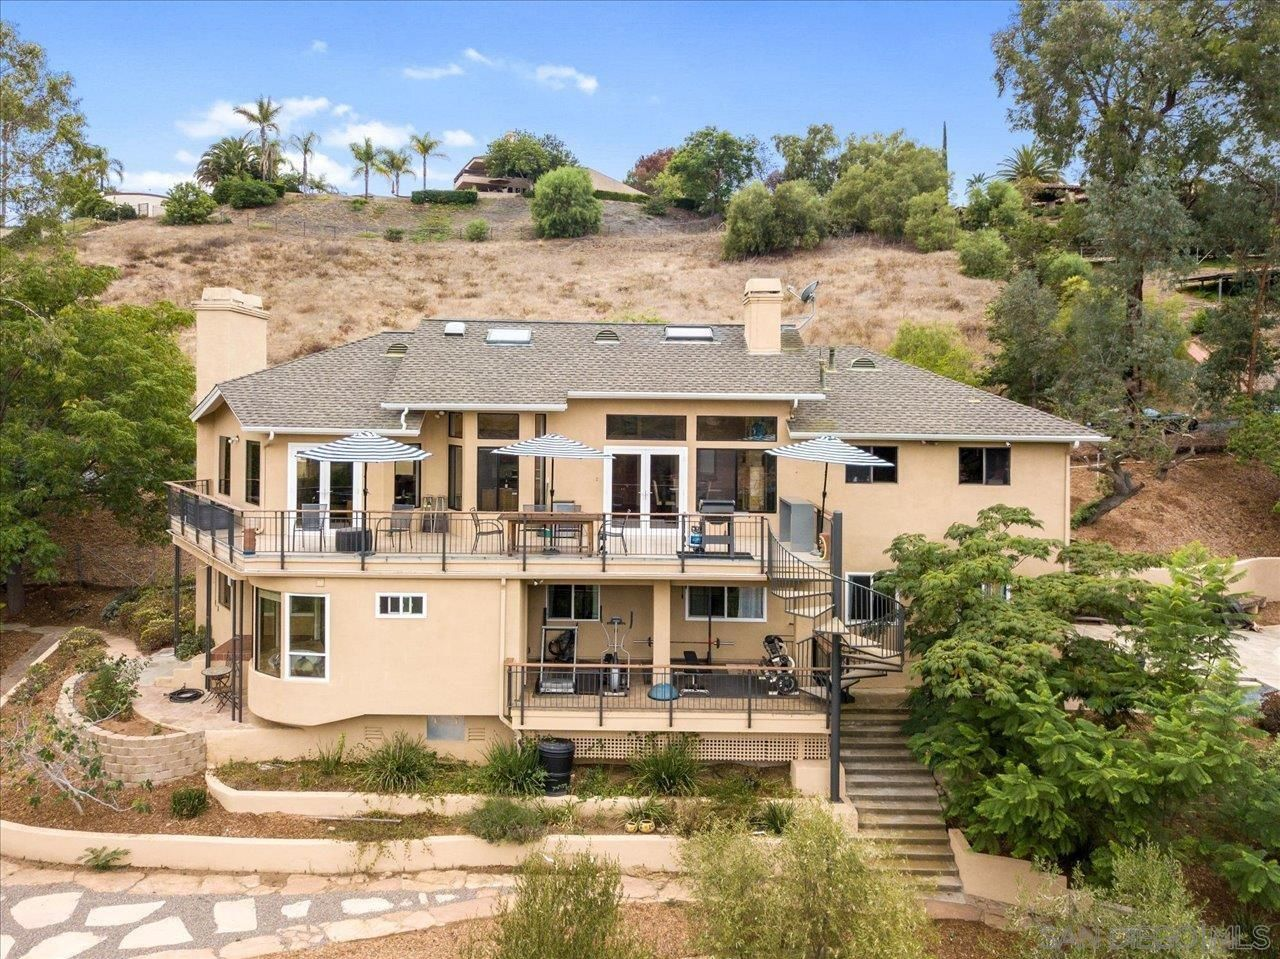 Main Photo: SOUTHEAST ESCONDIDO House for sale : 4 bedrooms : 1436 Sierra Linda Dr in Escondido